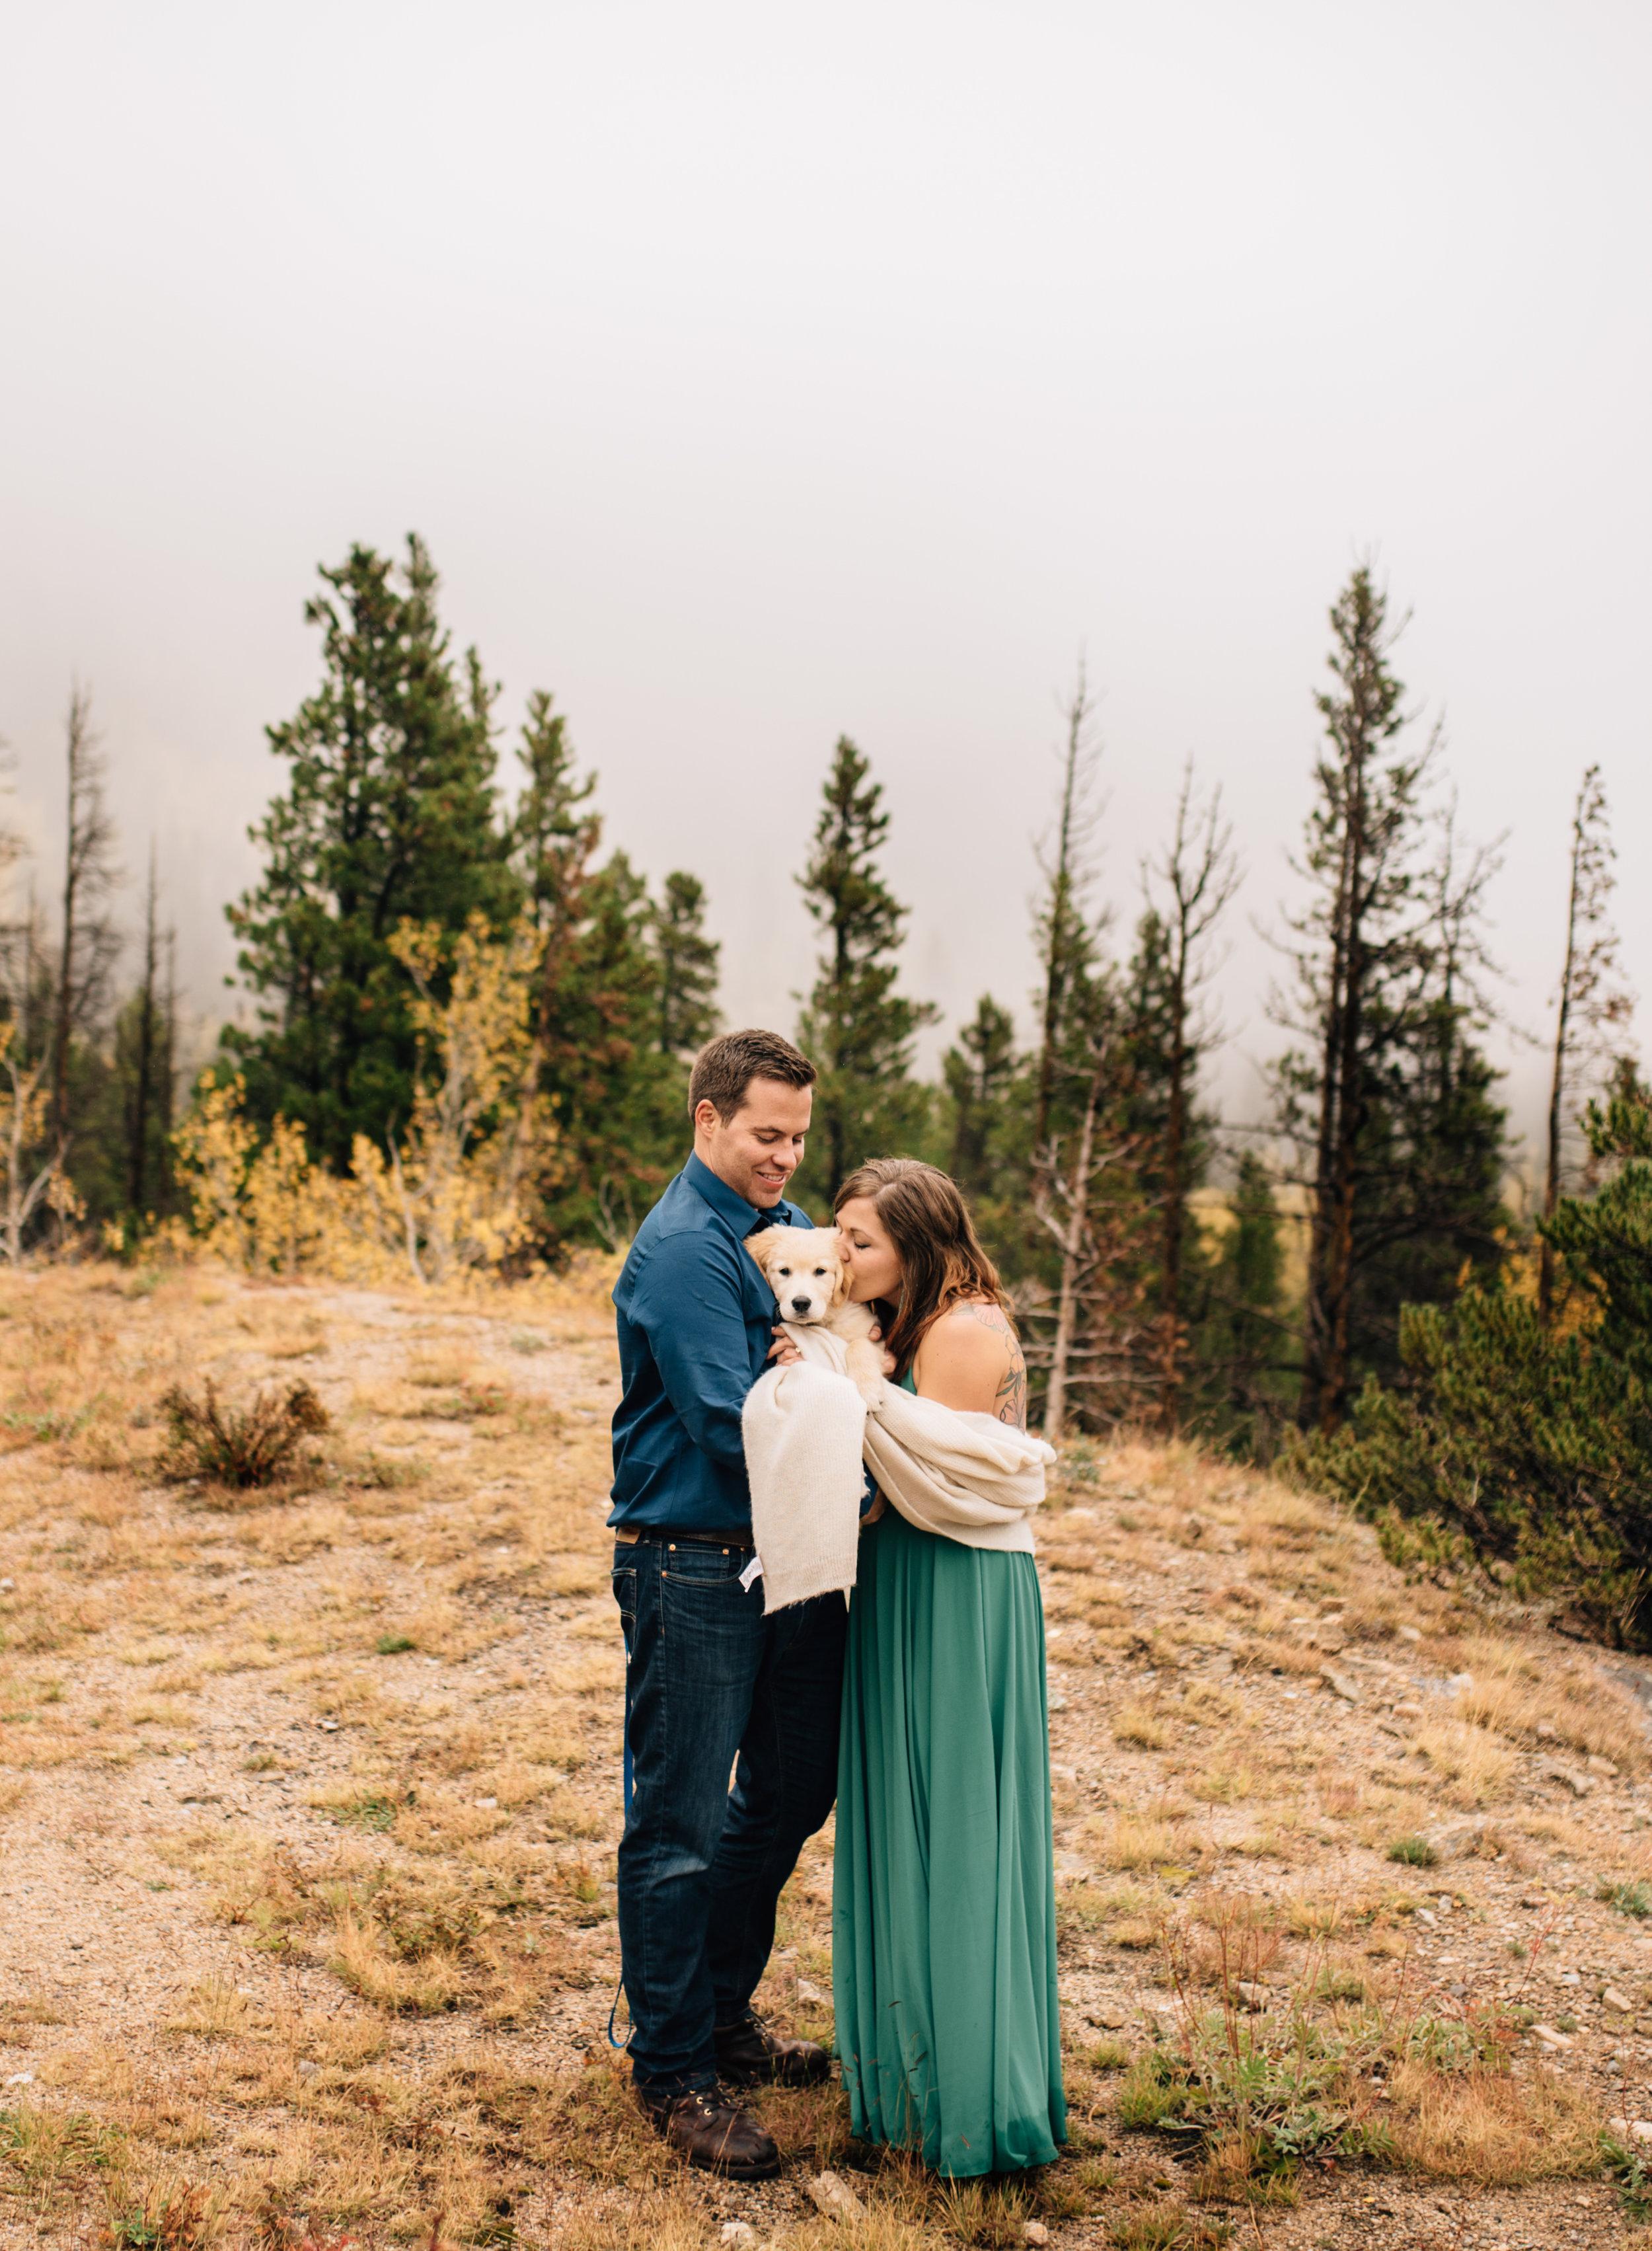 Telluride, Colorado elopement photographer.